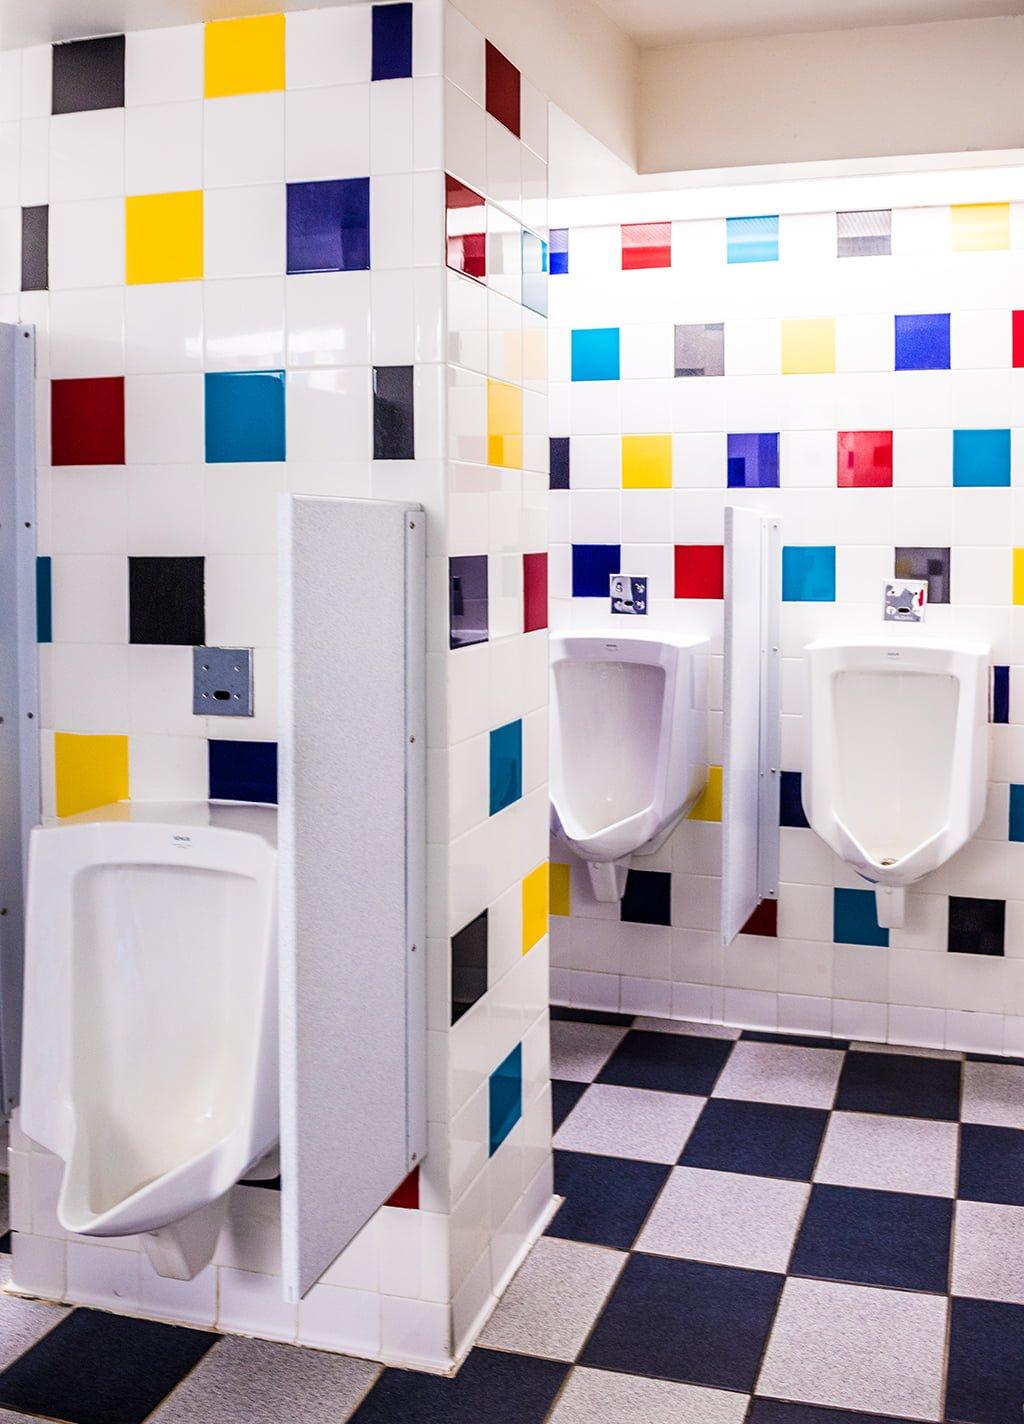 Top 10 Toilets At Disney World Disney Tourist Blog - Best-bathrooms